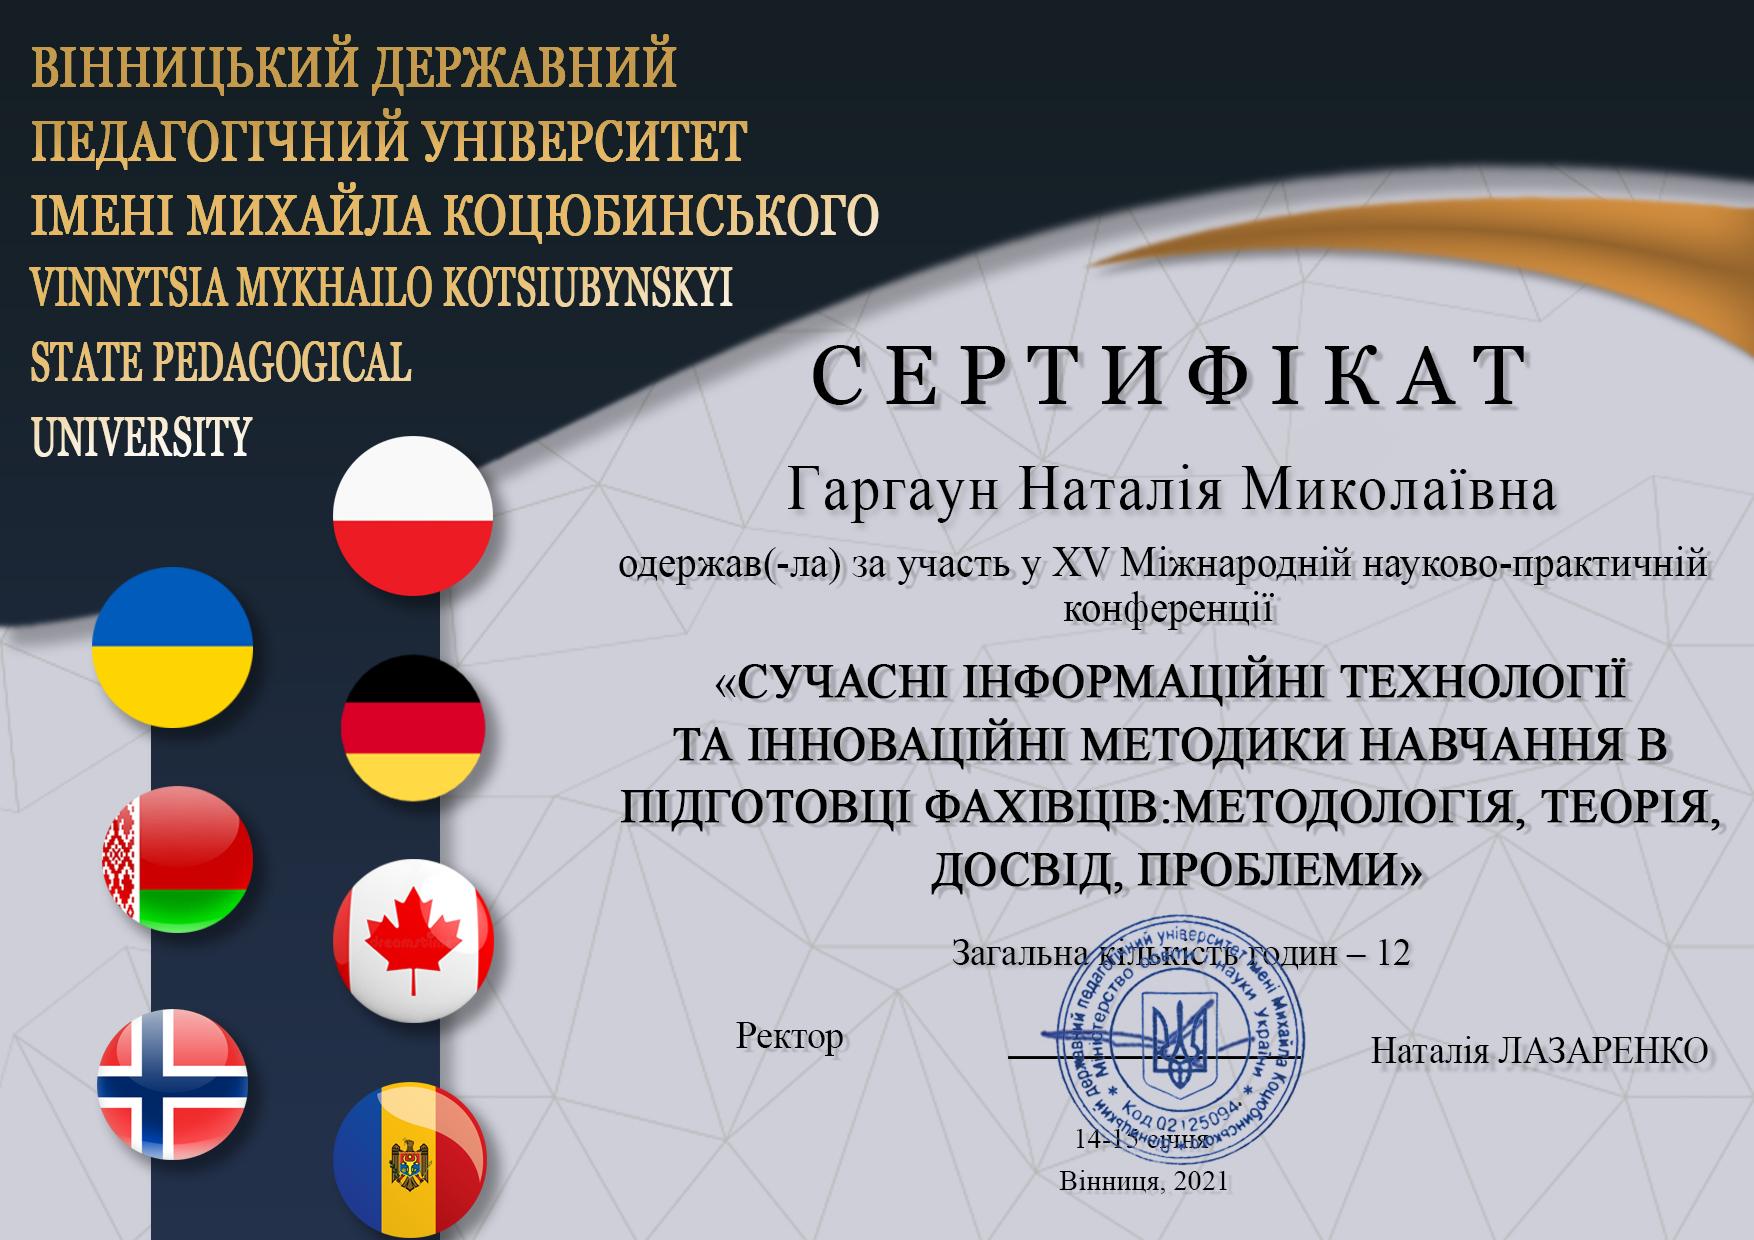 Гаргаун Наталія Миколаївна